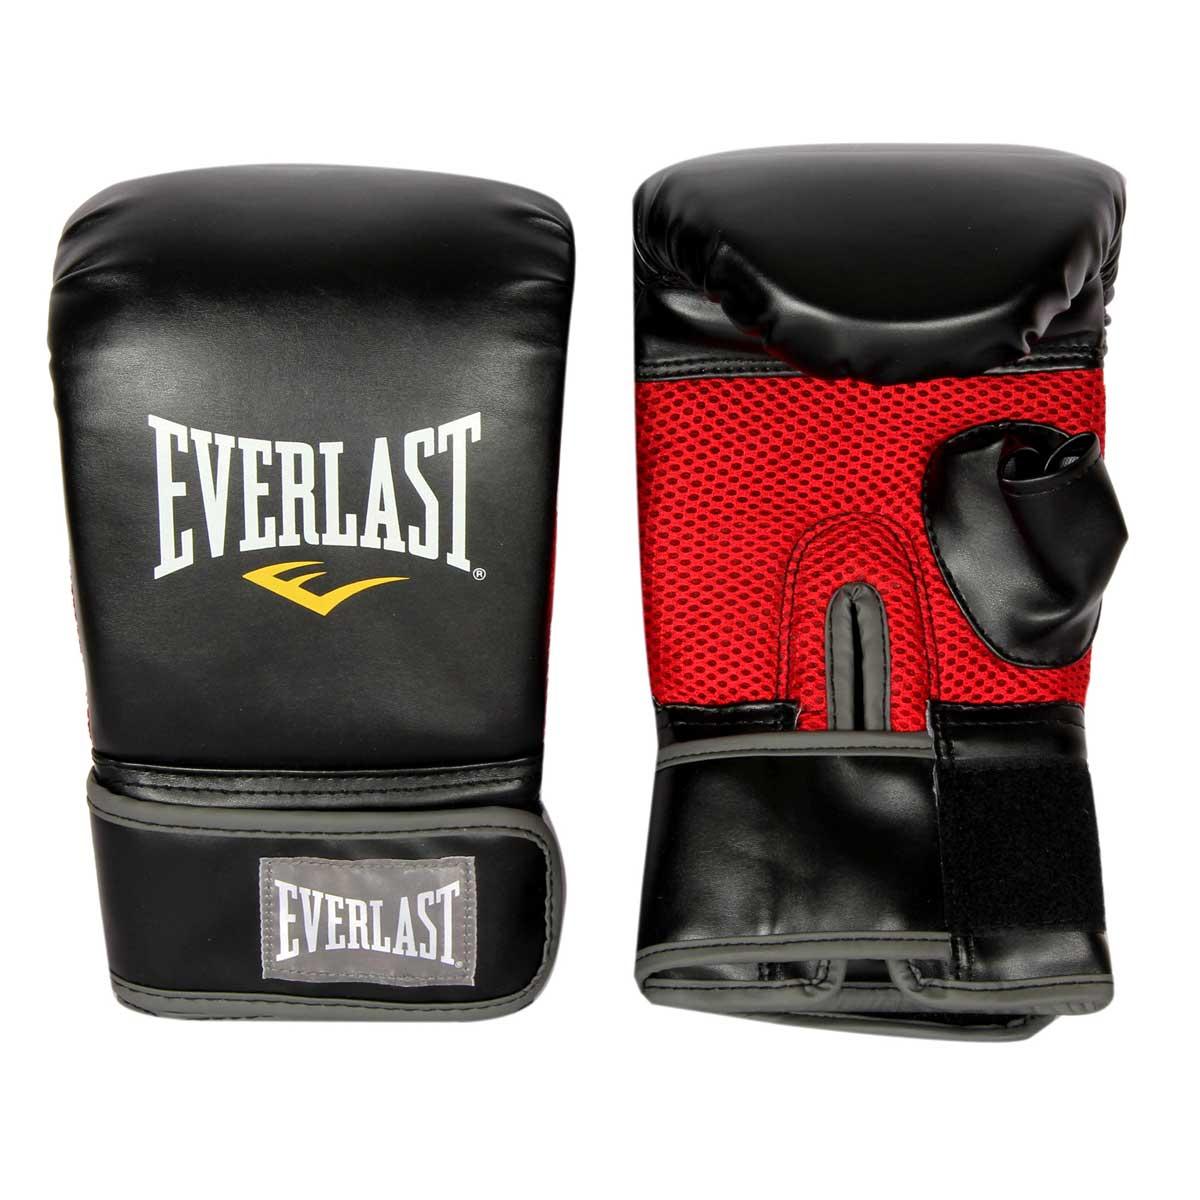 fb83bc157c0 Buy Everlast MMA Heavy Bag Gloves Online India